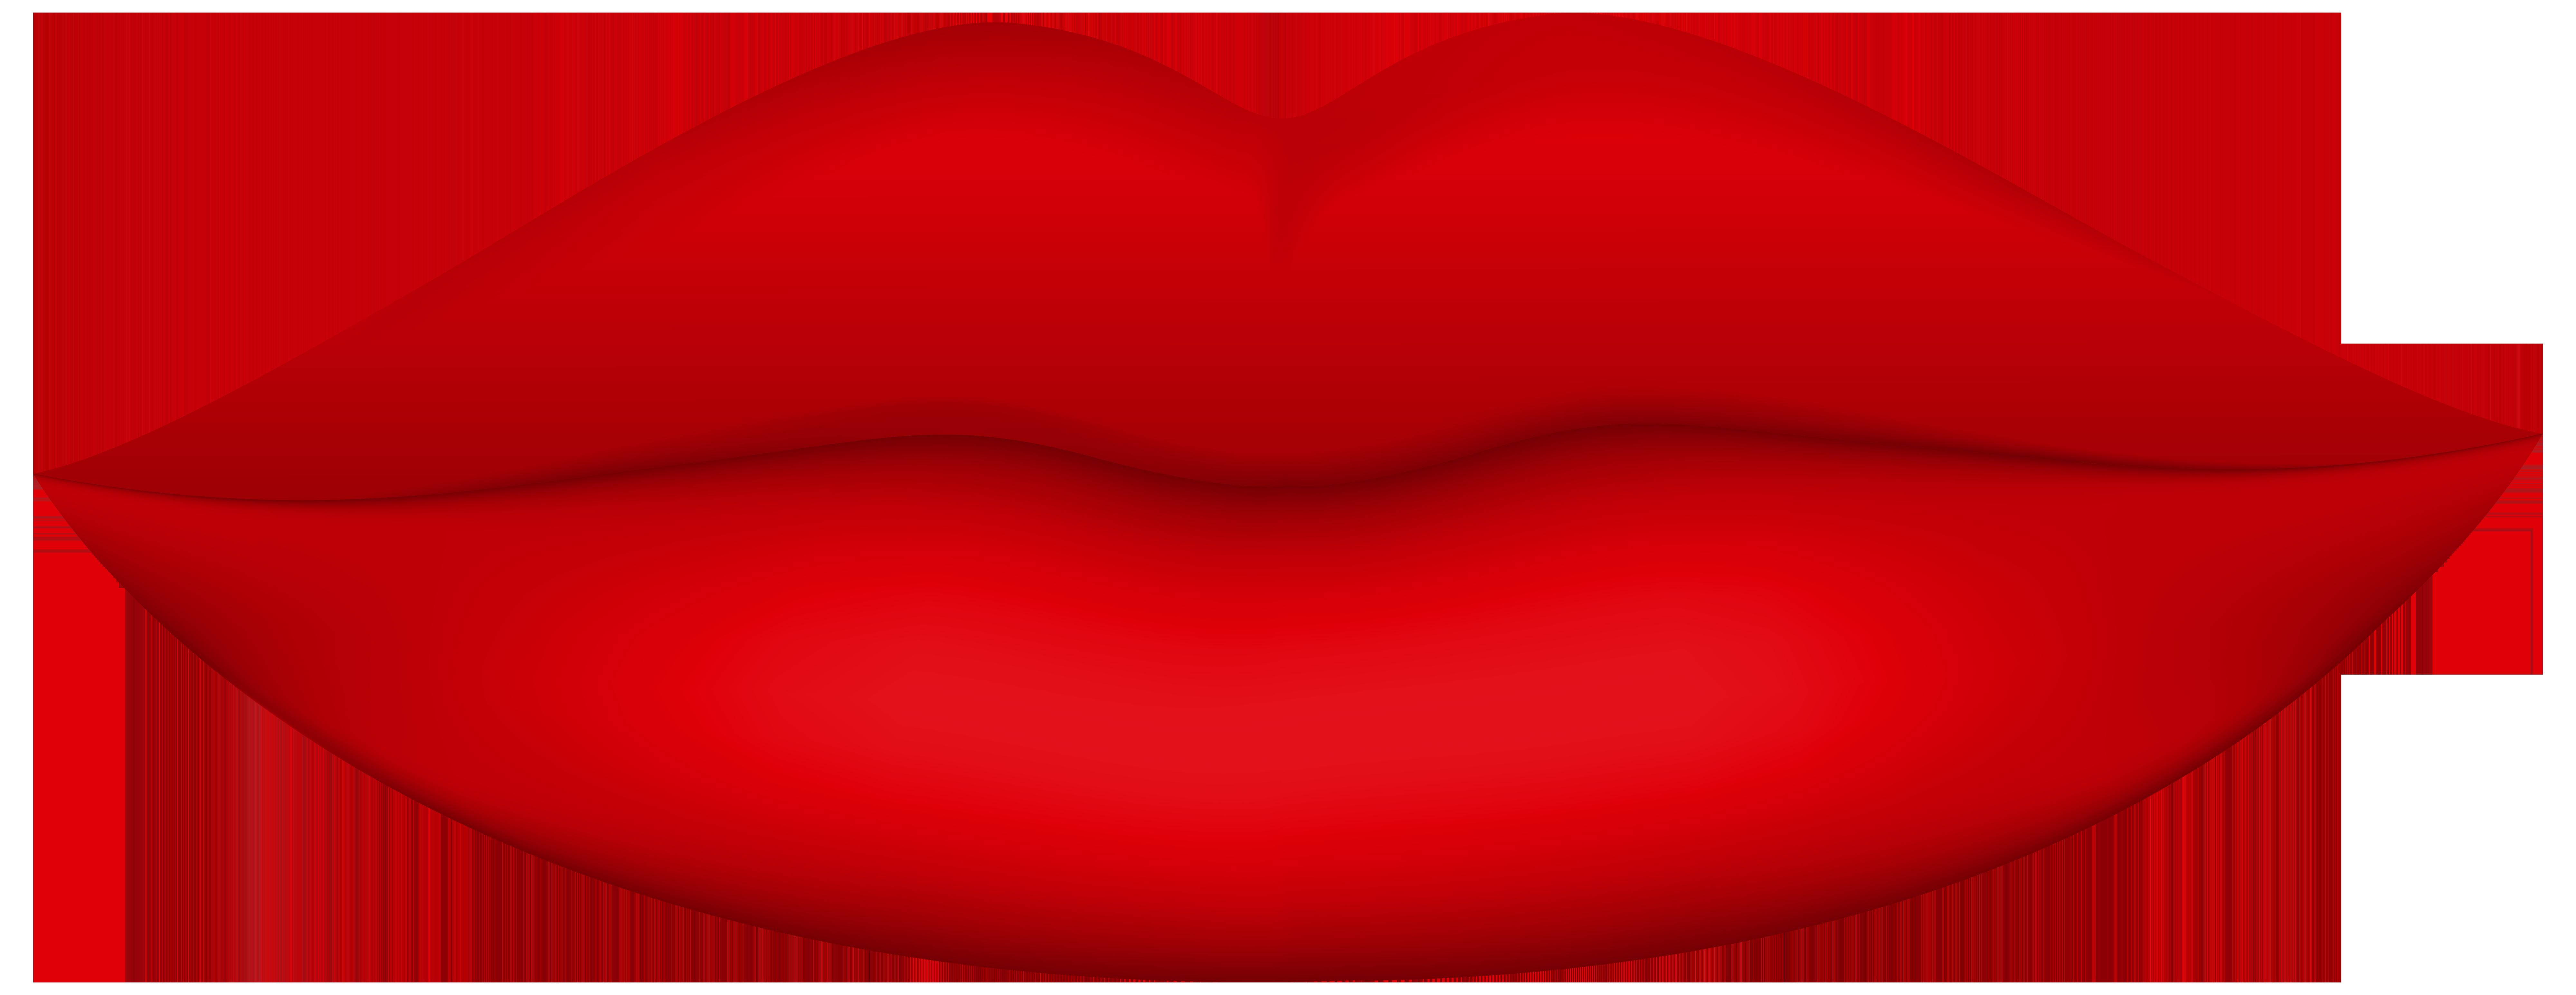 8000x3090 Lips Clipart